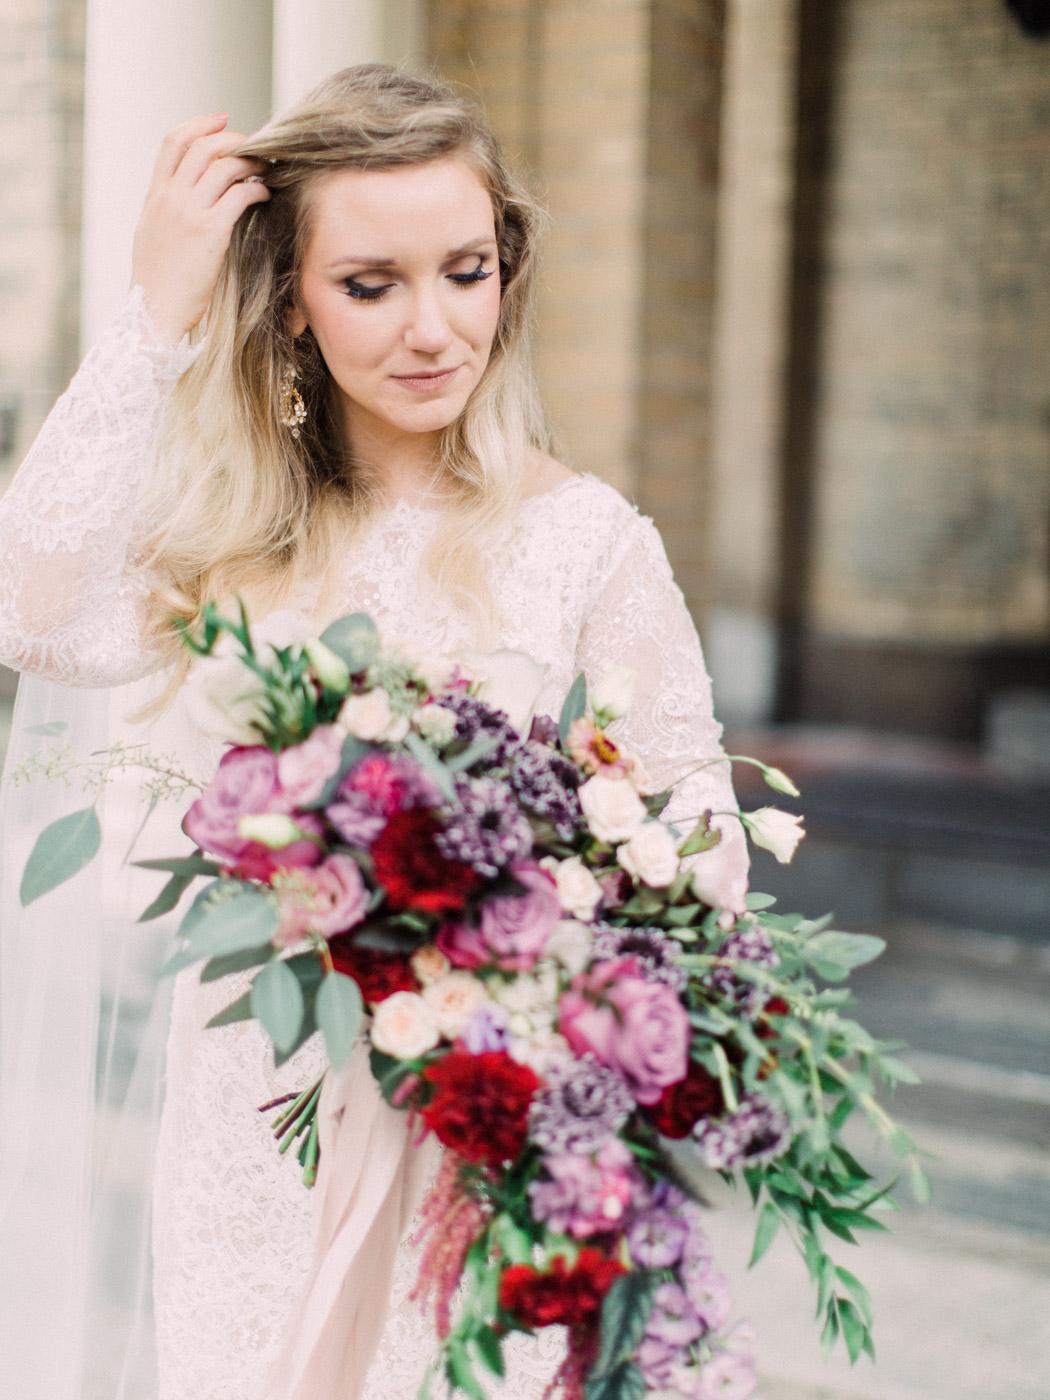 Toronto-wedding-photographer-intimate-classic-fine-art-elopement-ottawa45.jpg